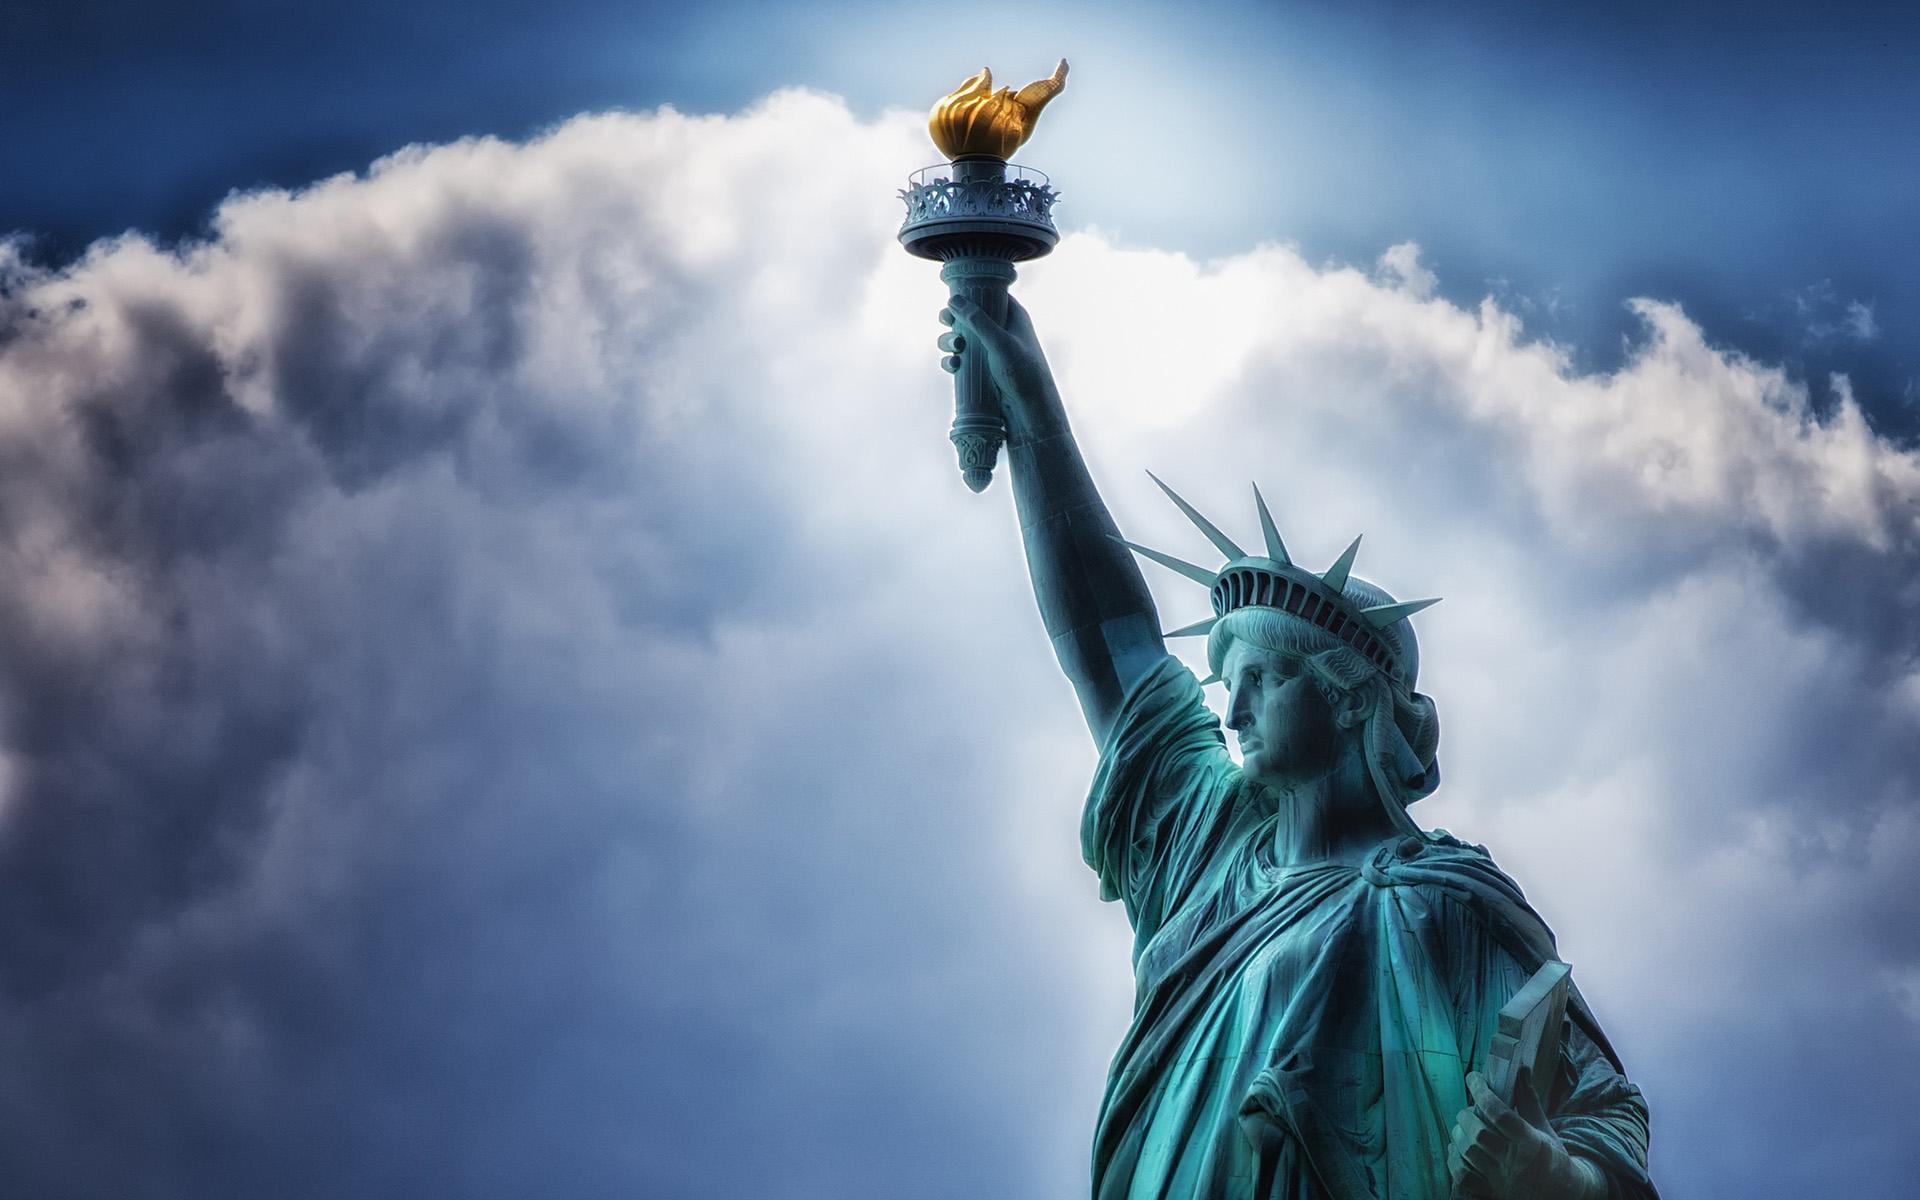 Statue of liberty wallpaper